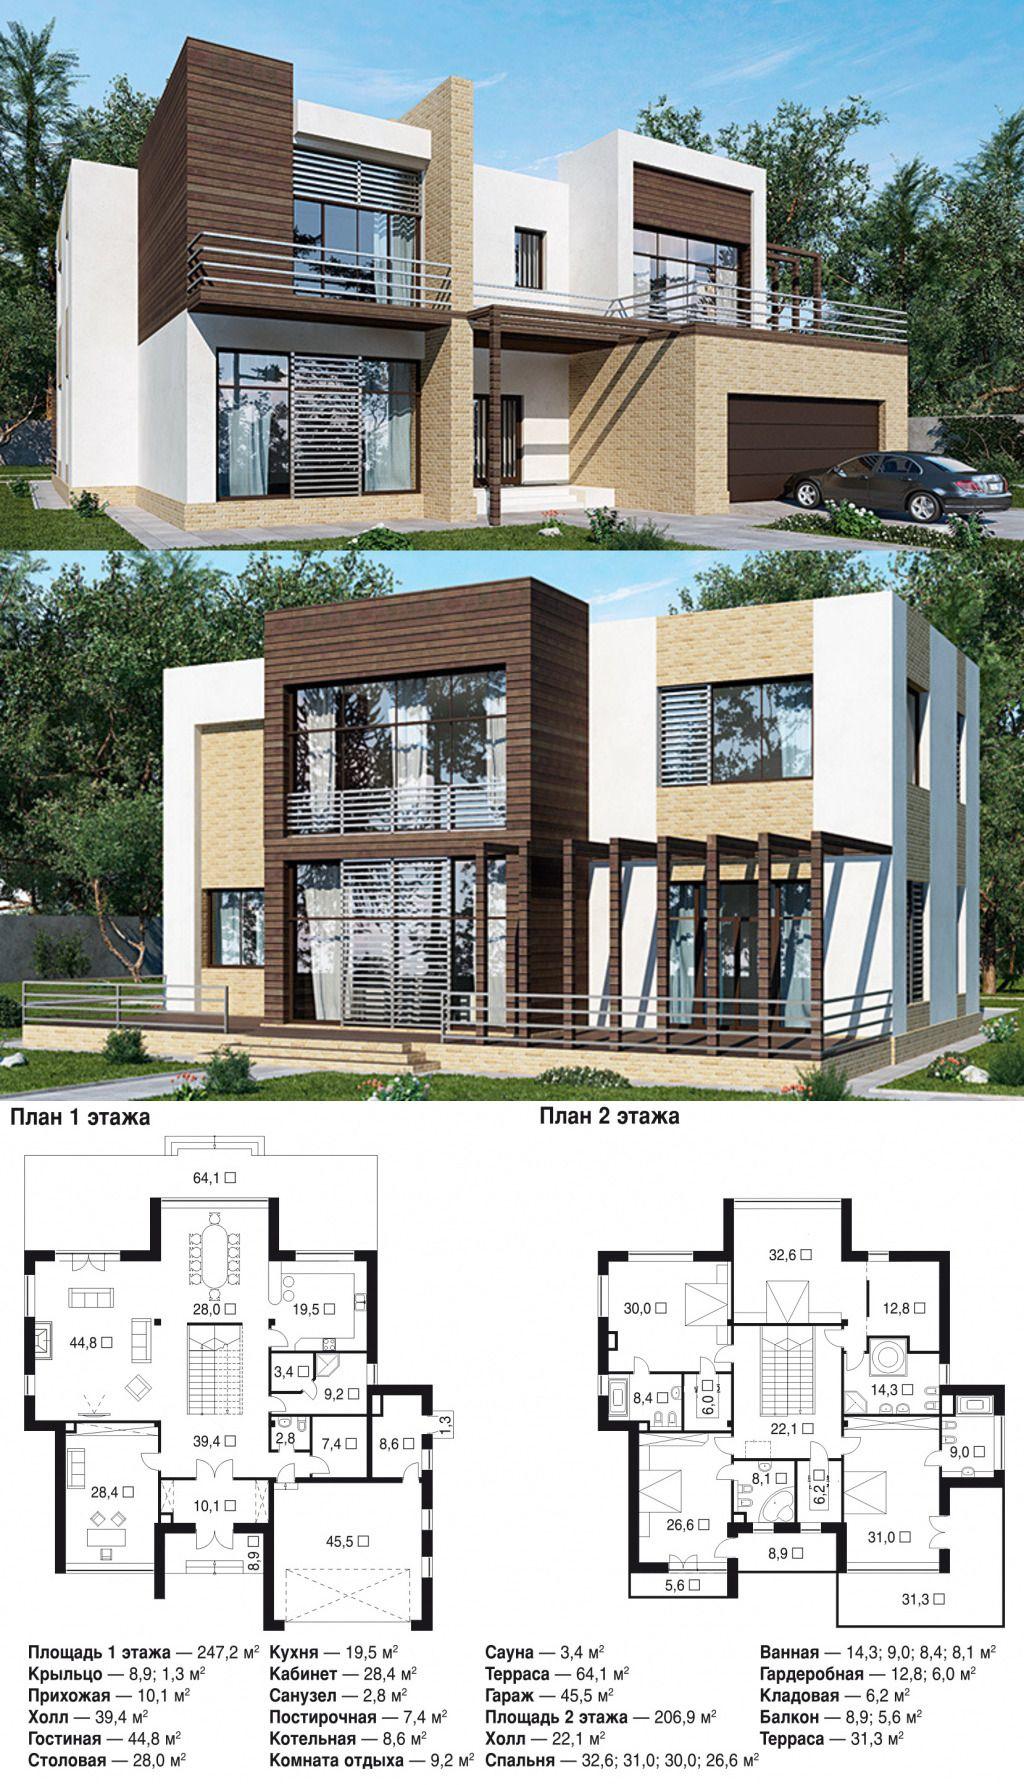 Great Home Ideea u2014 3608